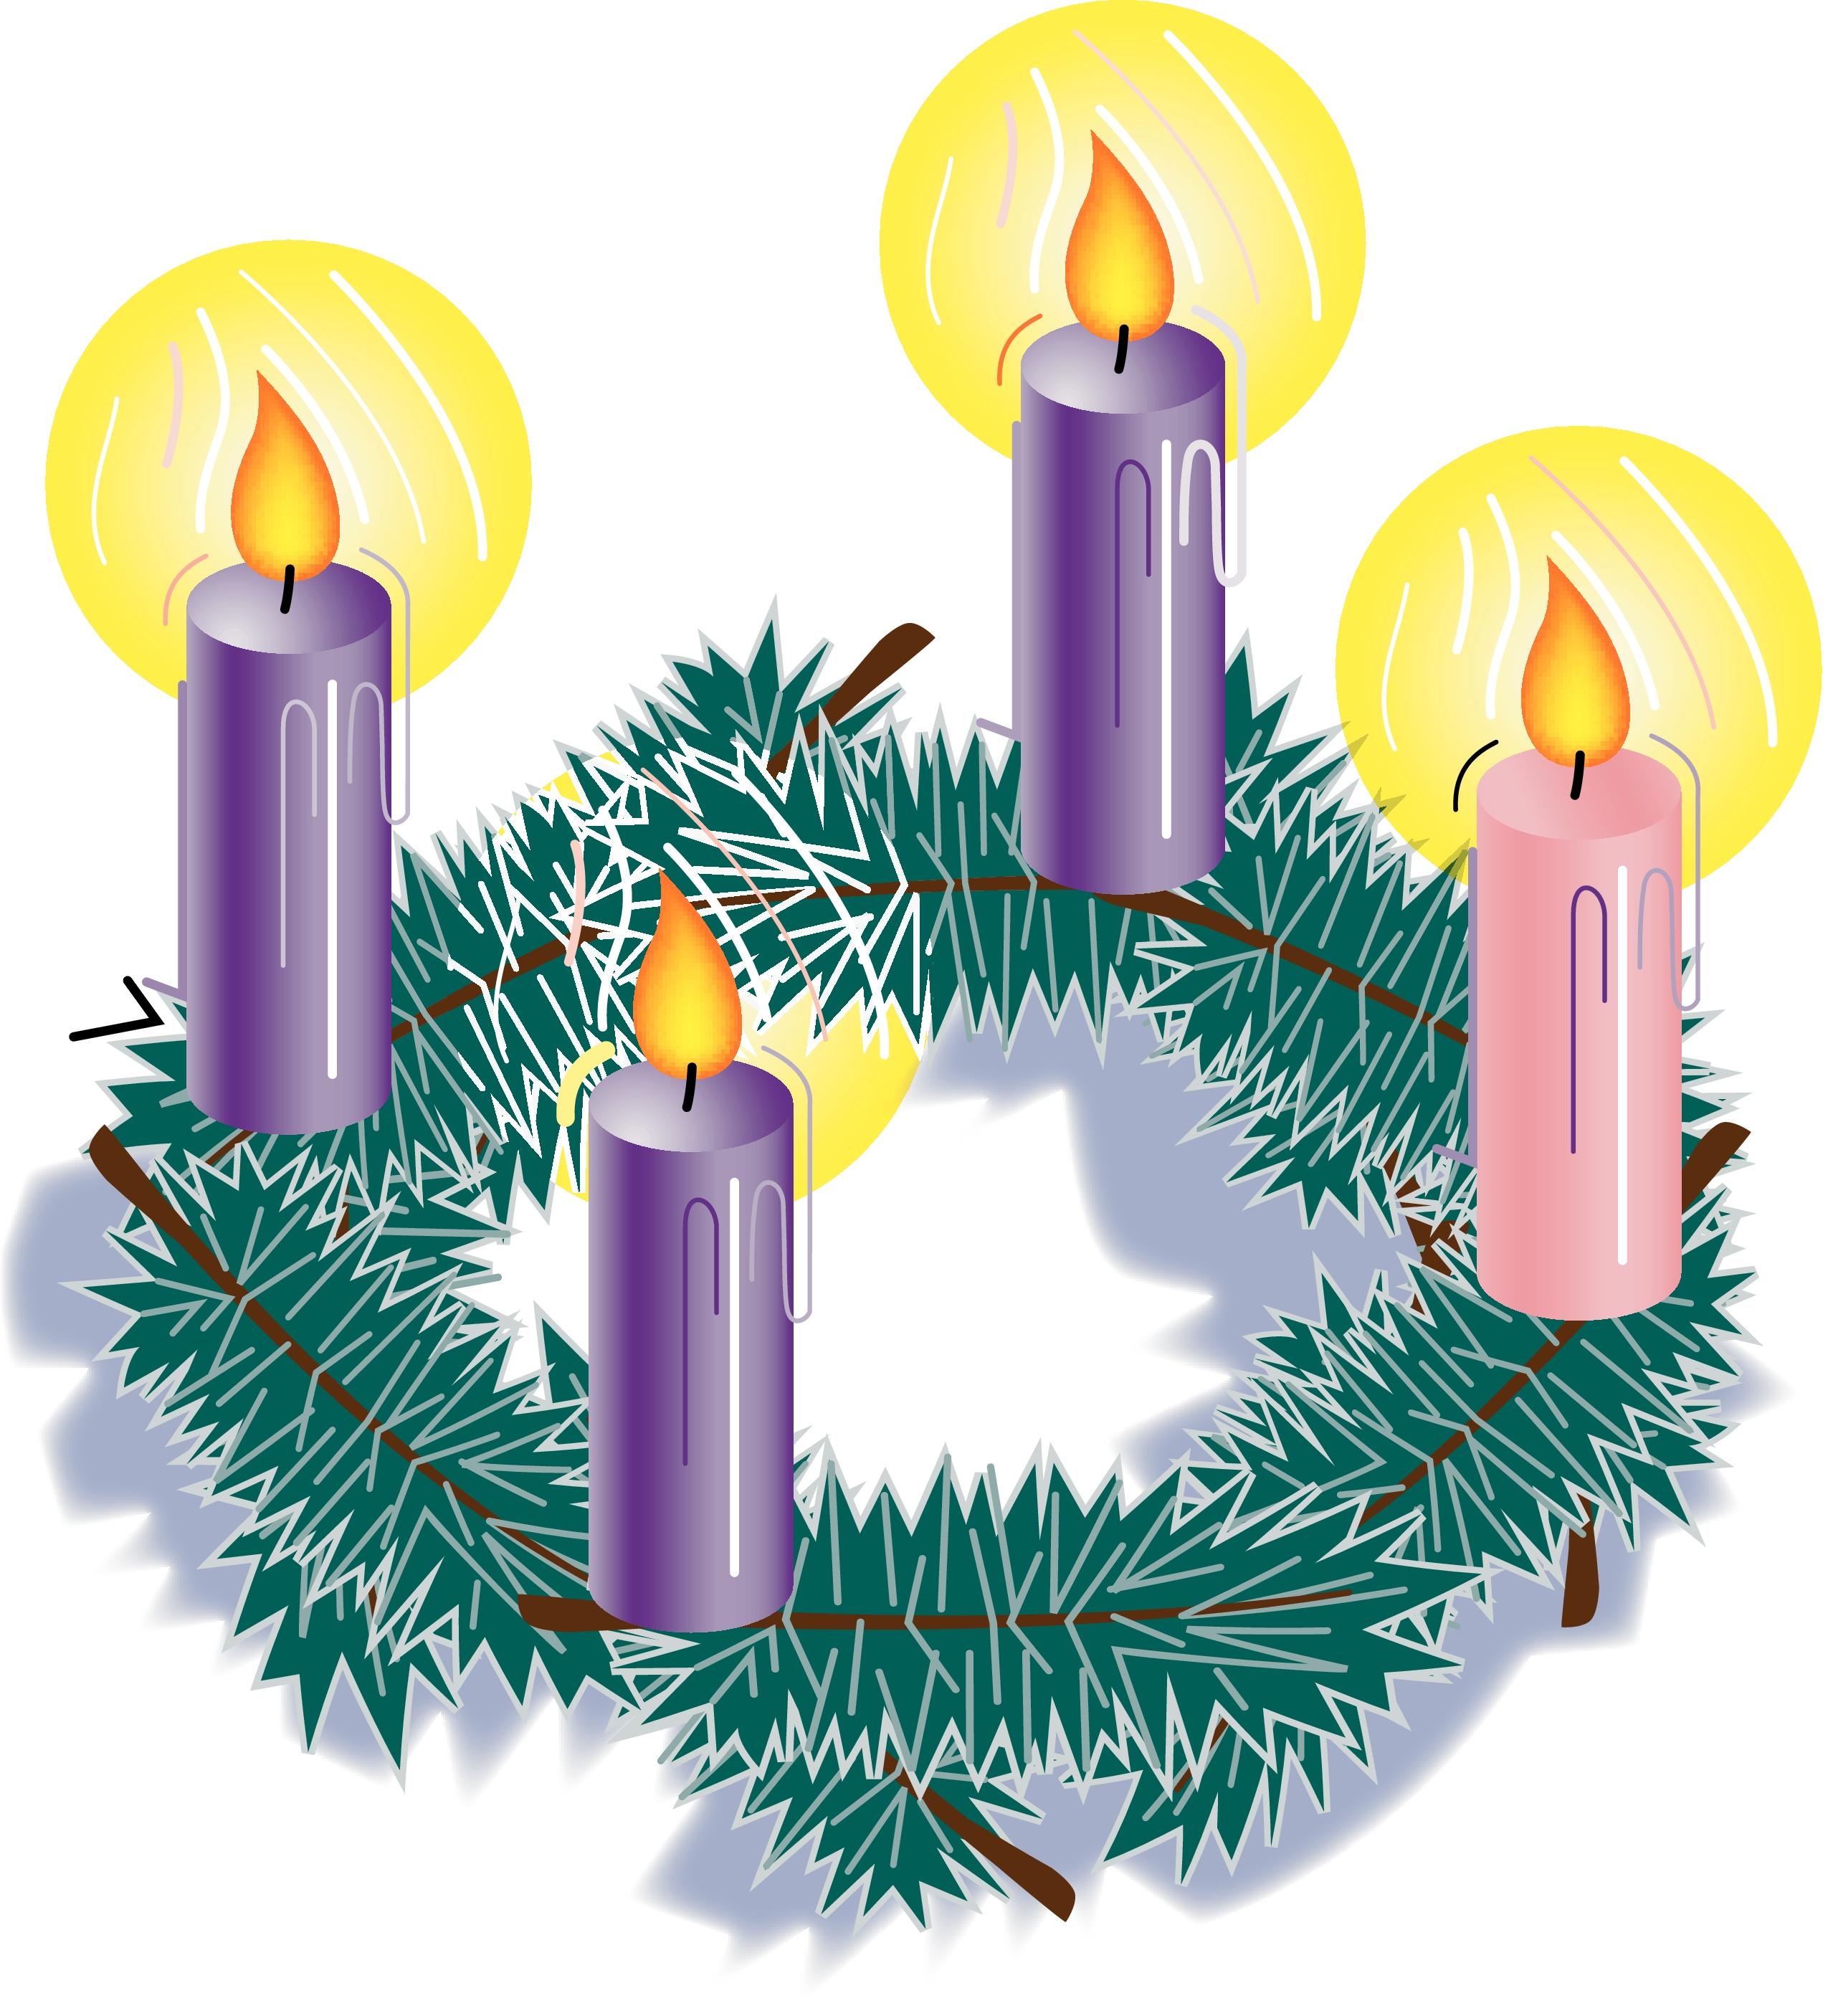 Animated Advent Wreath Clipart.